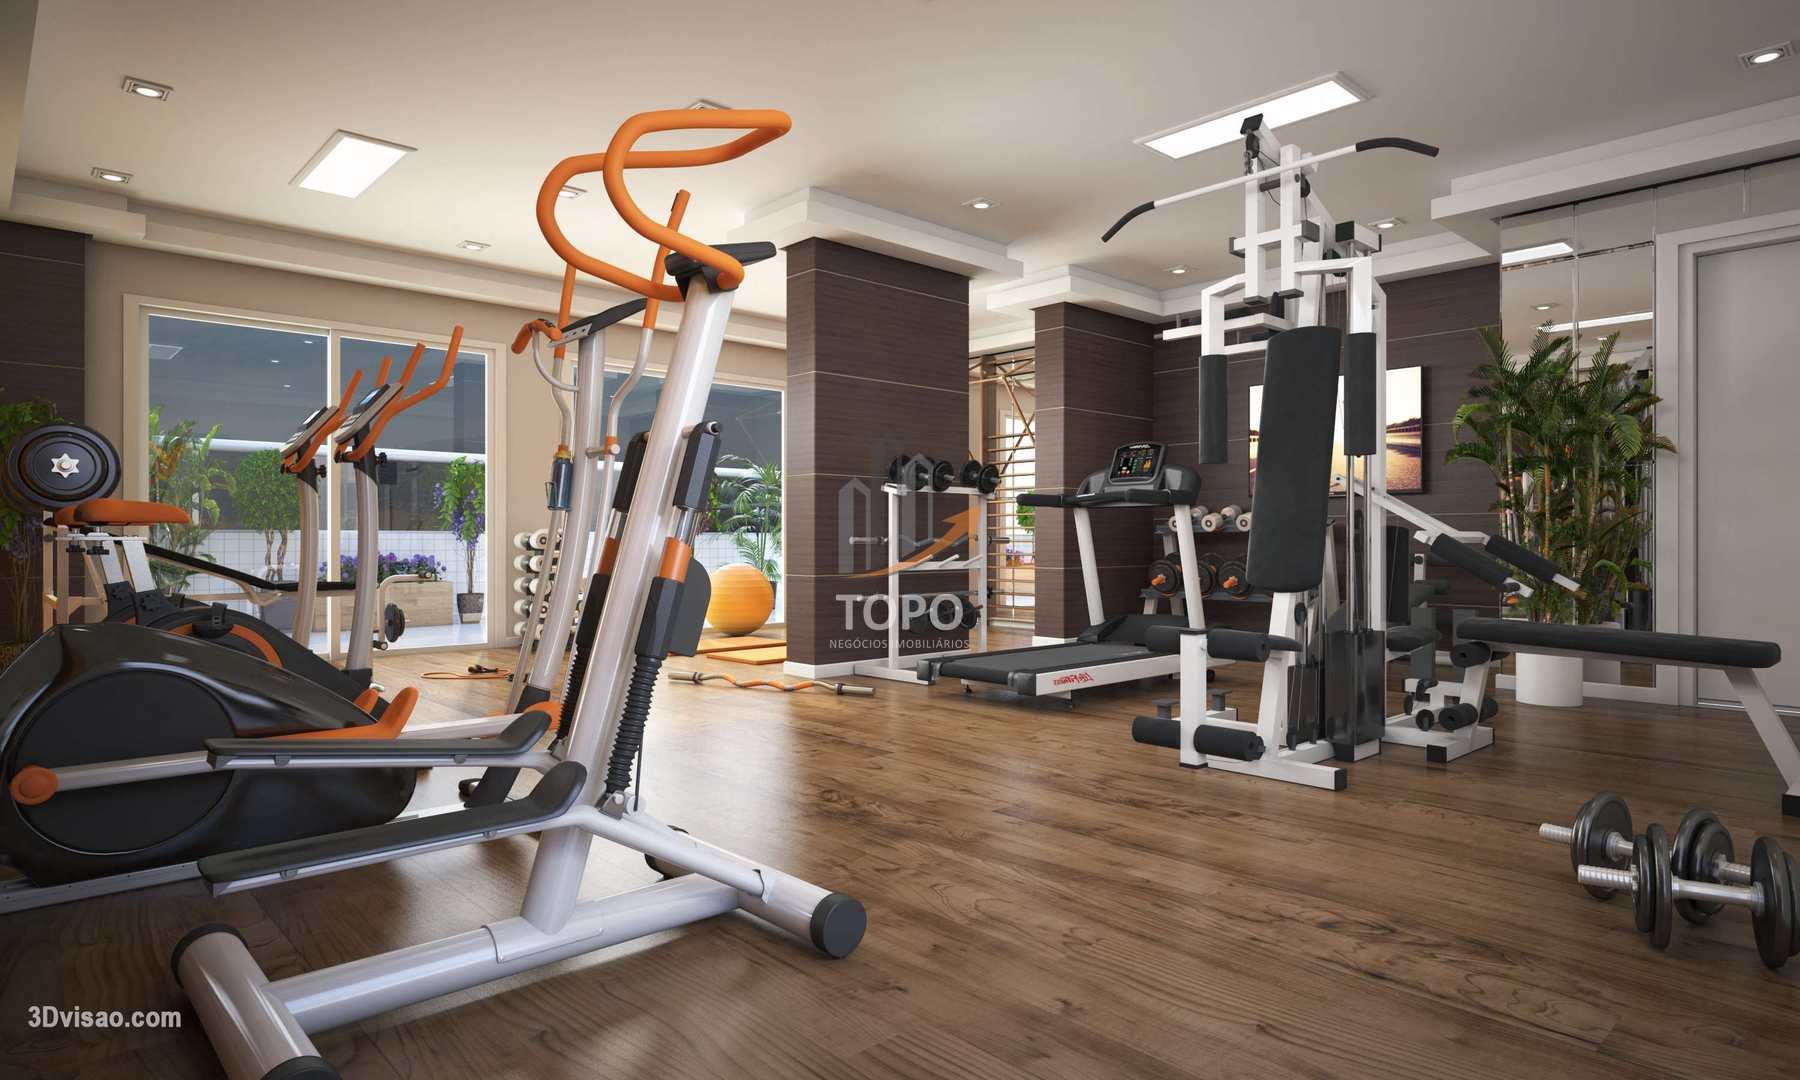 07 - Perspectiva Artística Fitness